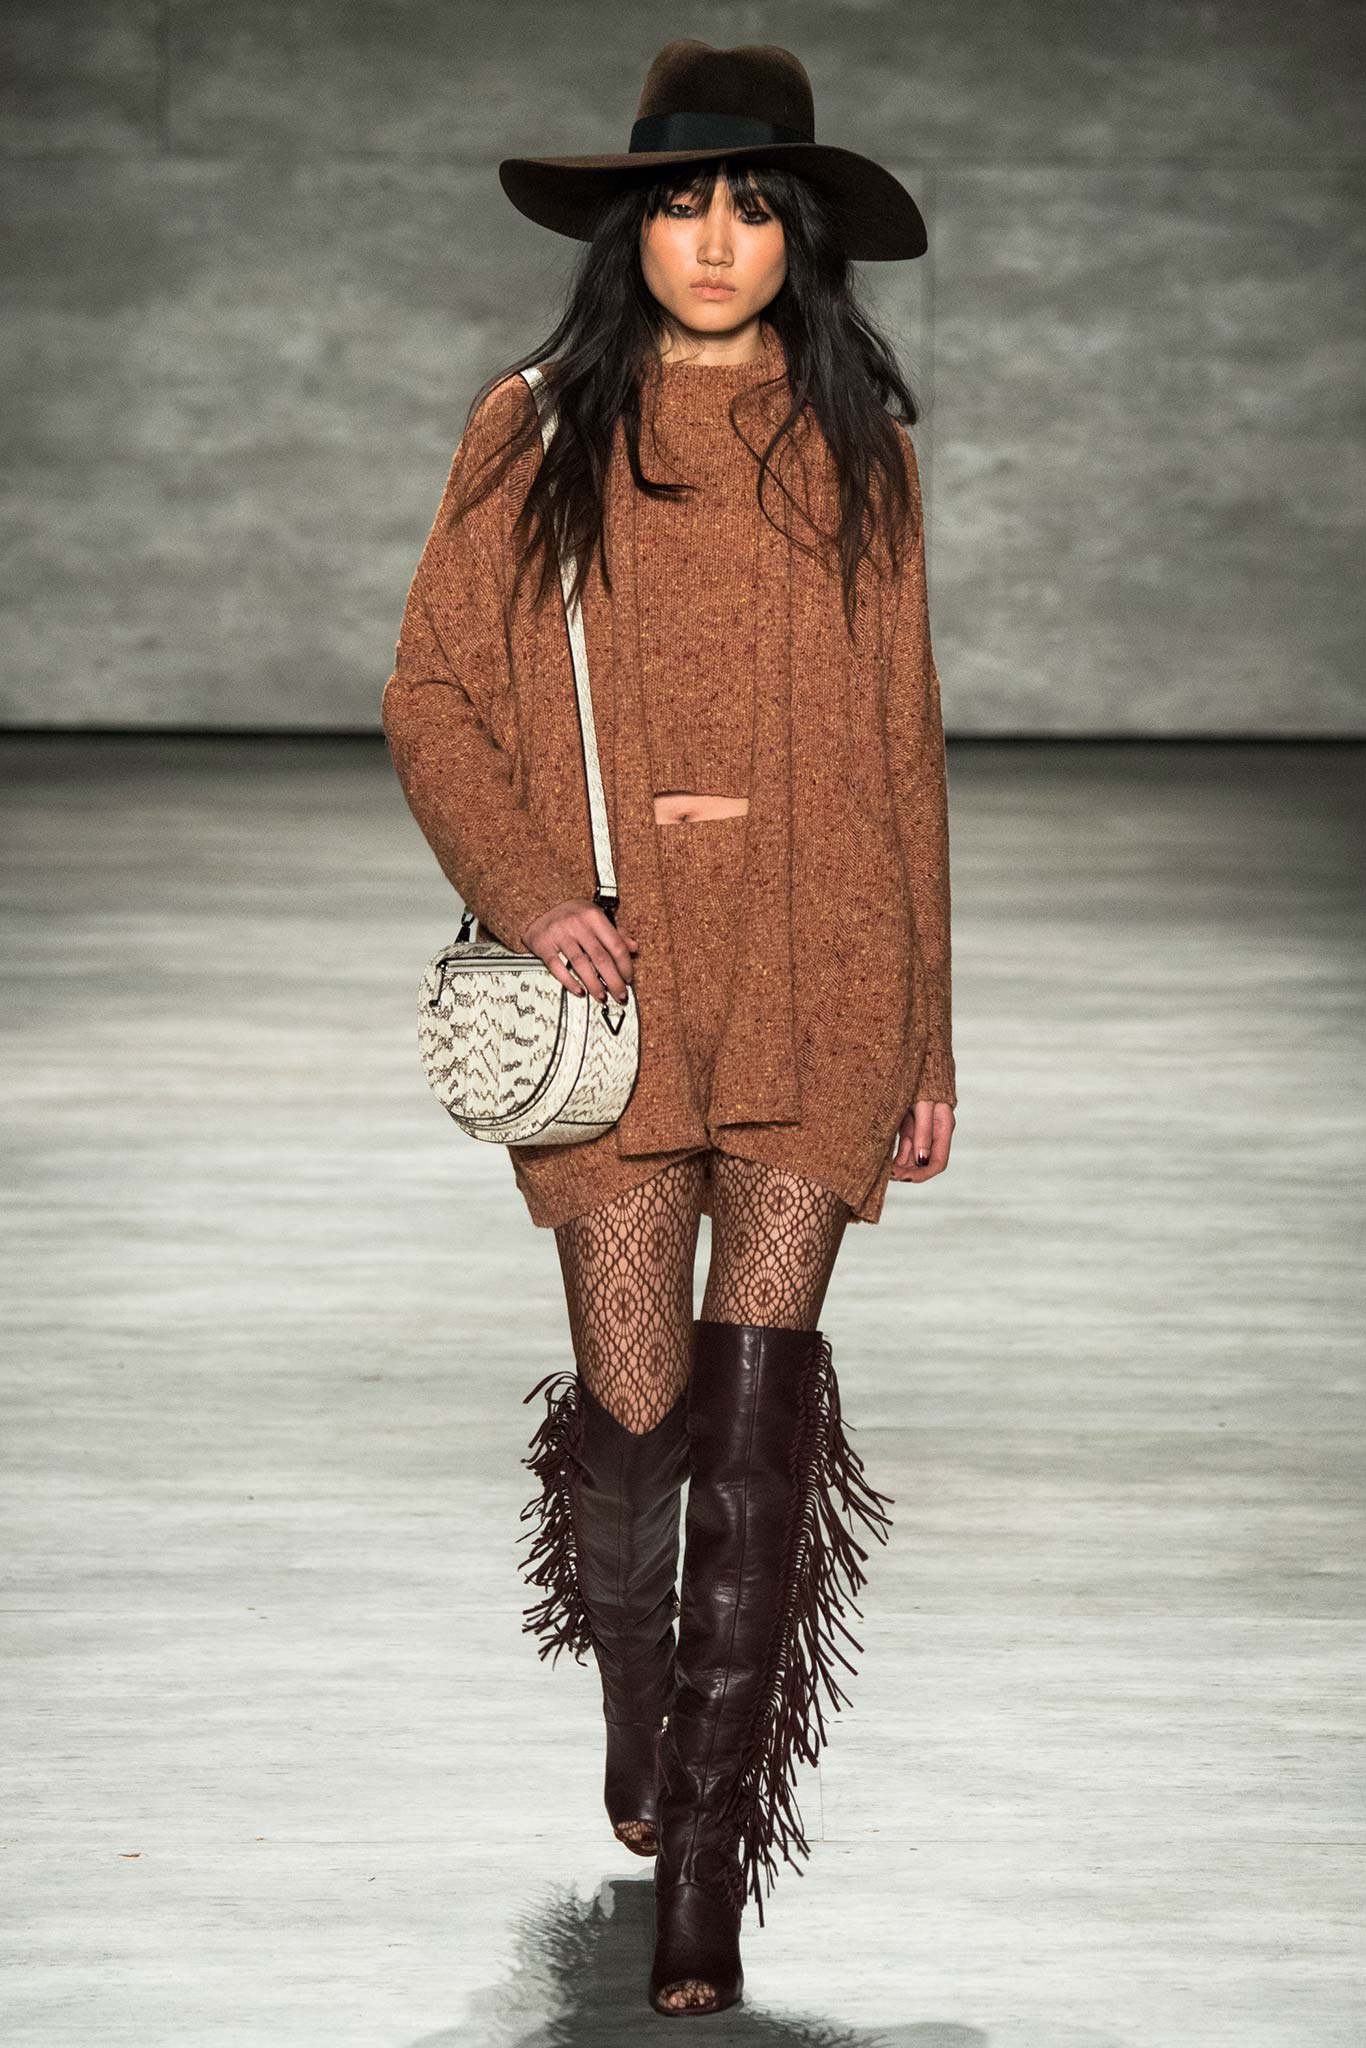 Rebecca Minkoff Fall 2015 Ready-to-Wear Look 15 Photo: Yannis Vlamos / Indigitalimages.com | Style.com | Fall 2015 RTW Runway Looks